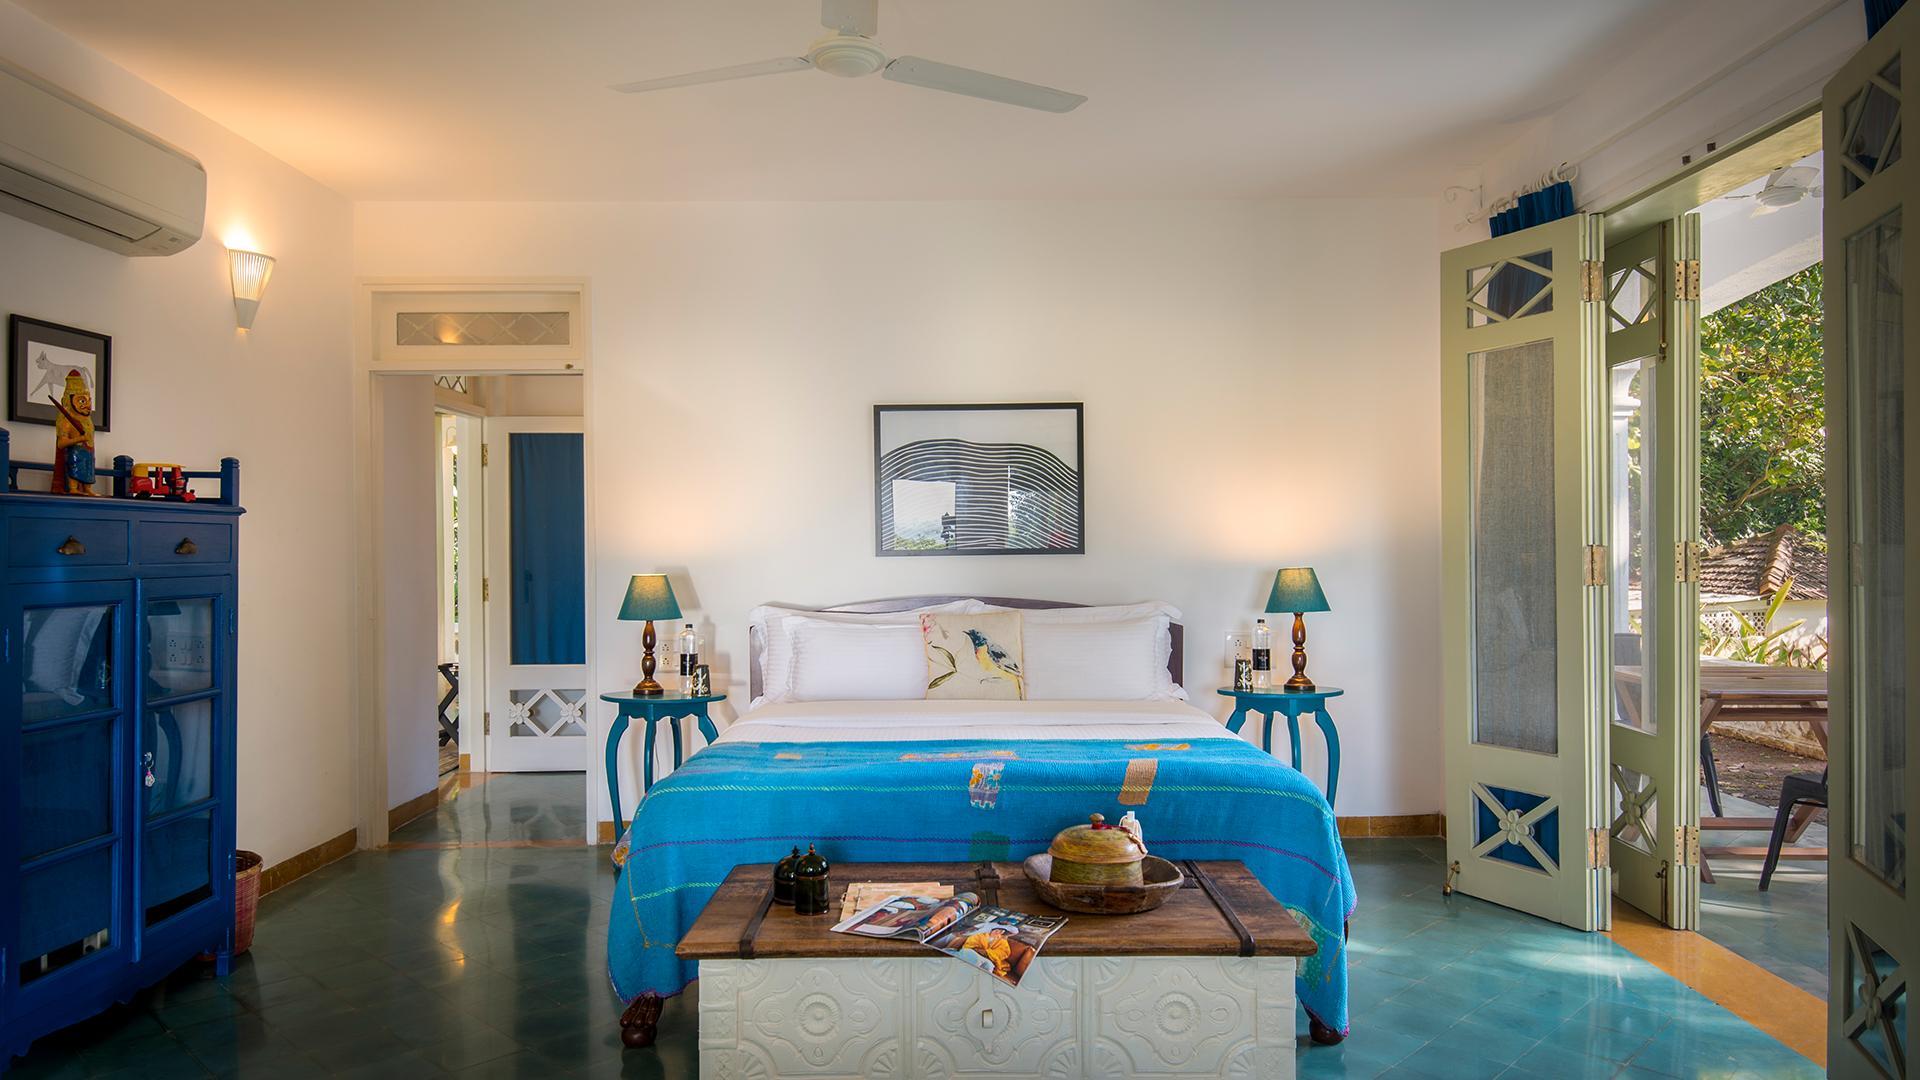 Mandovi Room  image 1 at The Postcard Velha 2019 by North Goa, Goa, India